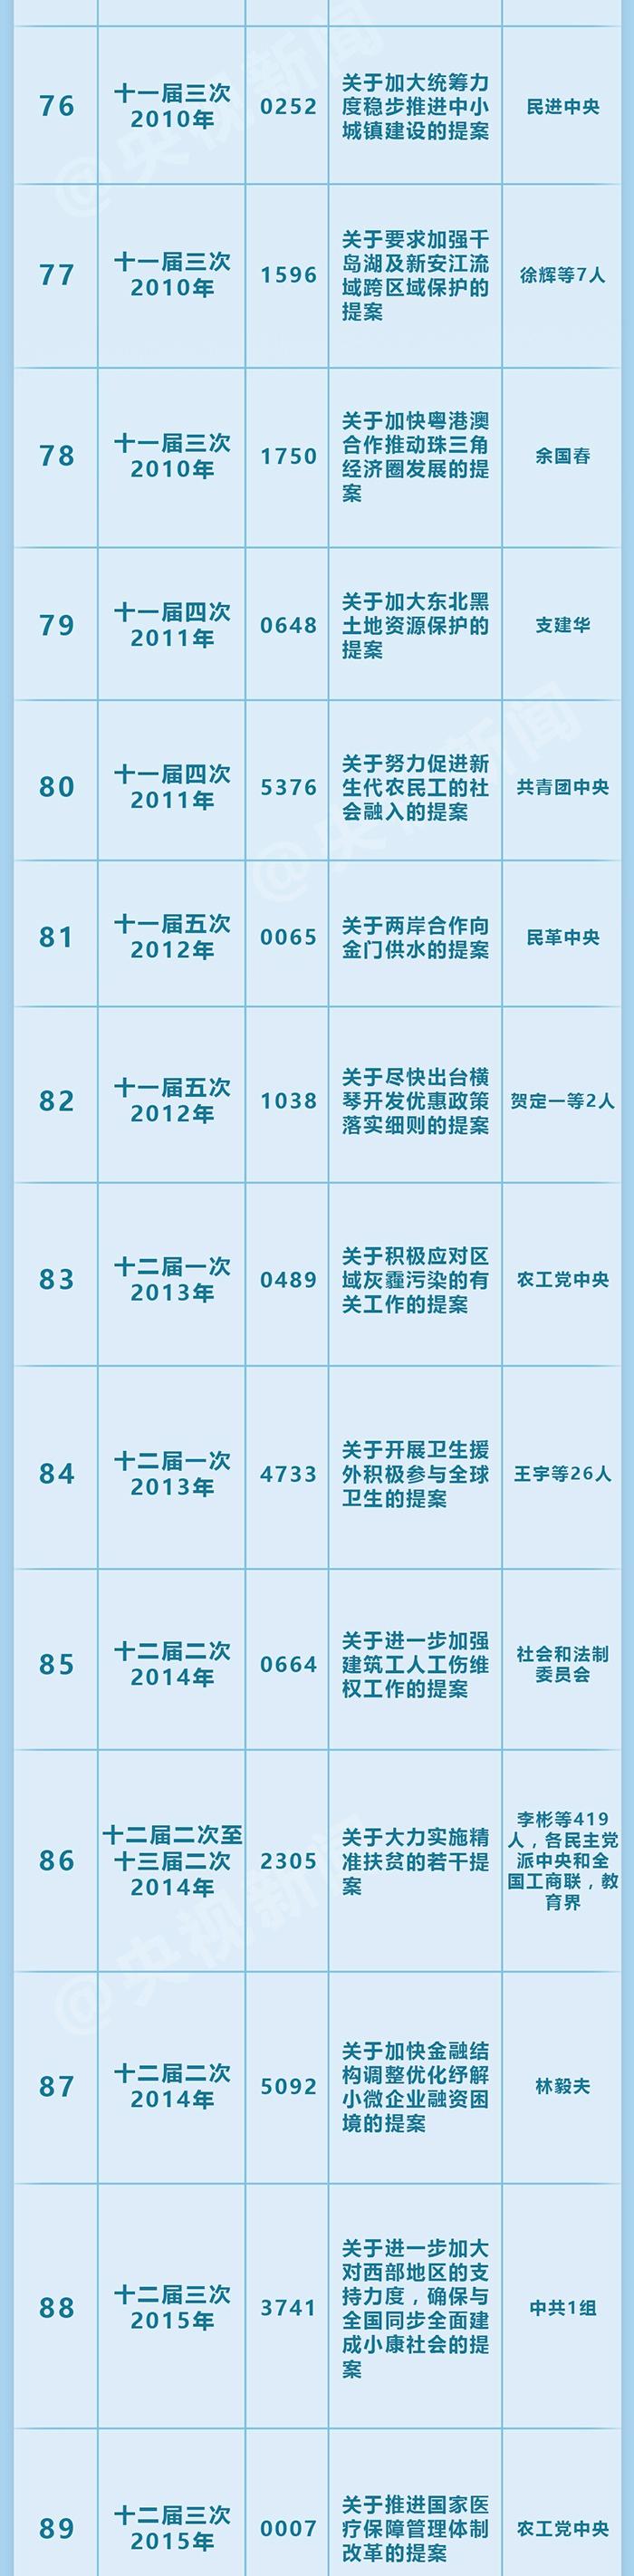 pp体育足球竞猜投注 中国近现代国画史上的顶级画师,谁更出众?